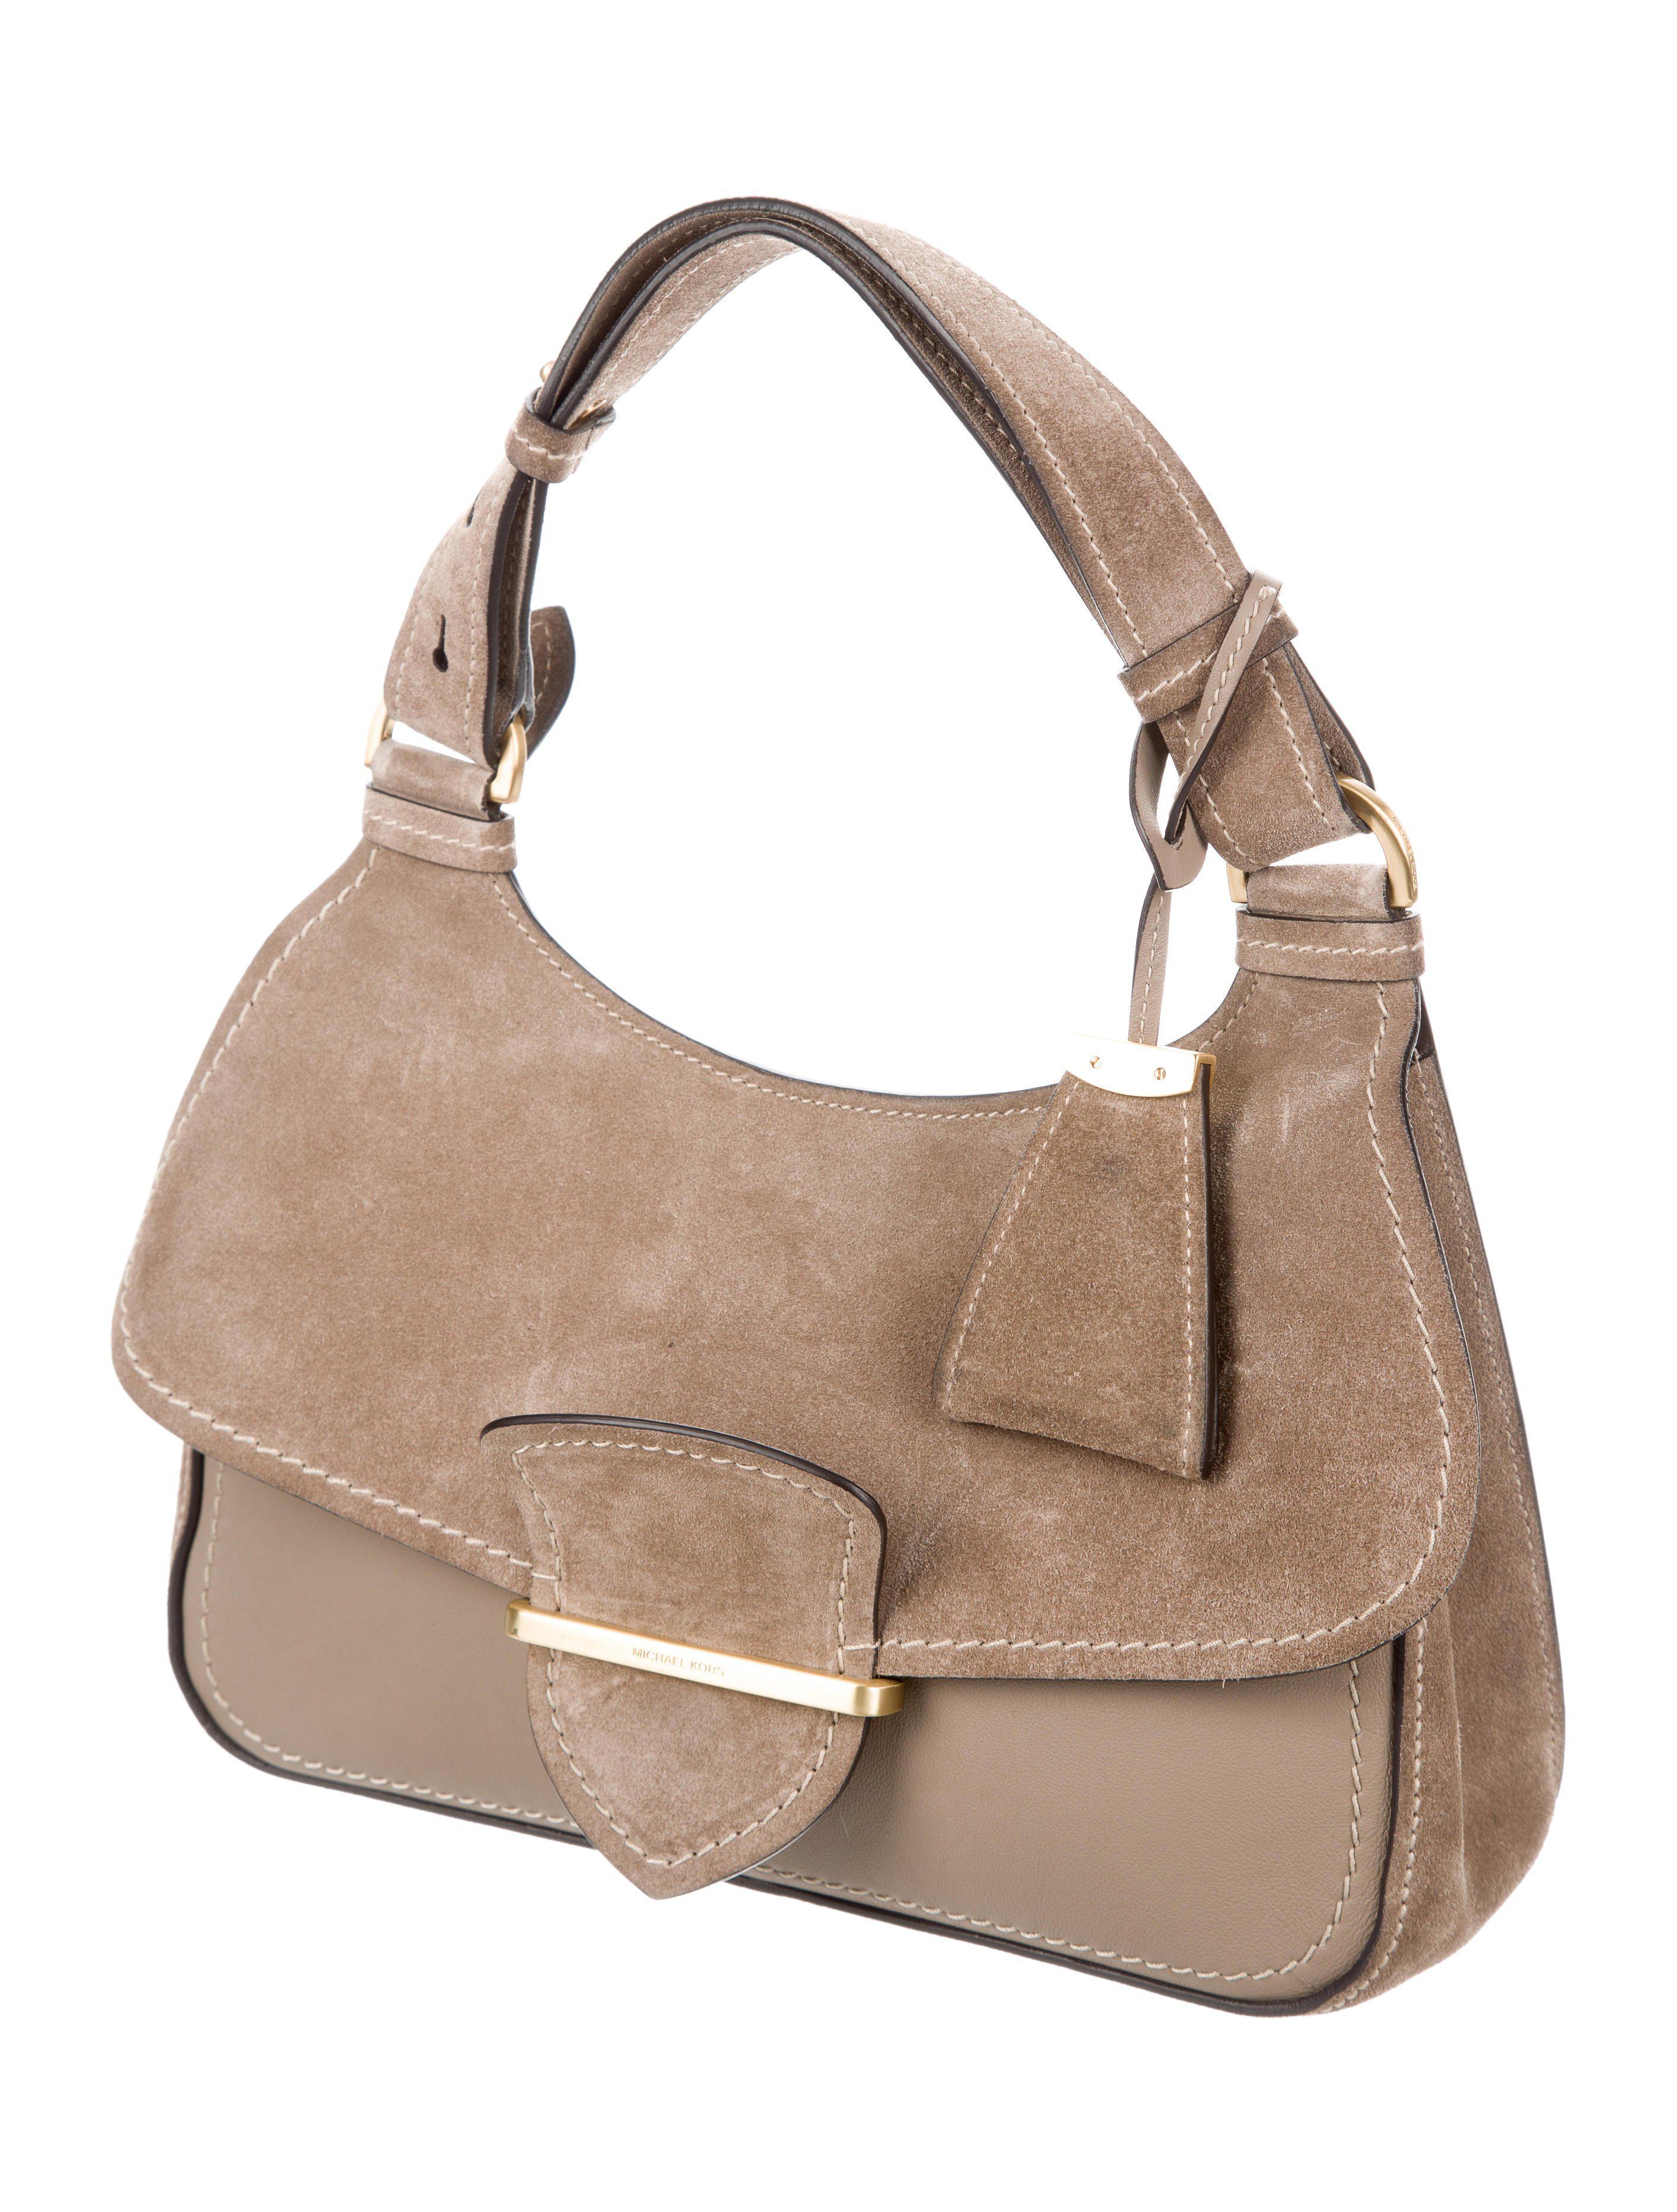 70f7b64c4f Lyst - Michael Kors Medium Josie Bag Grey in Metallic